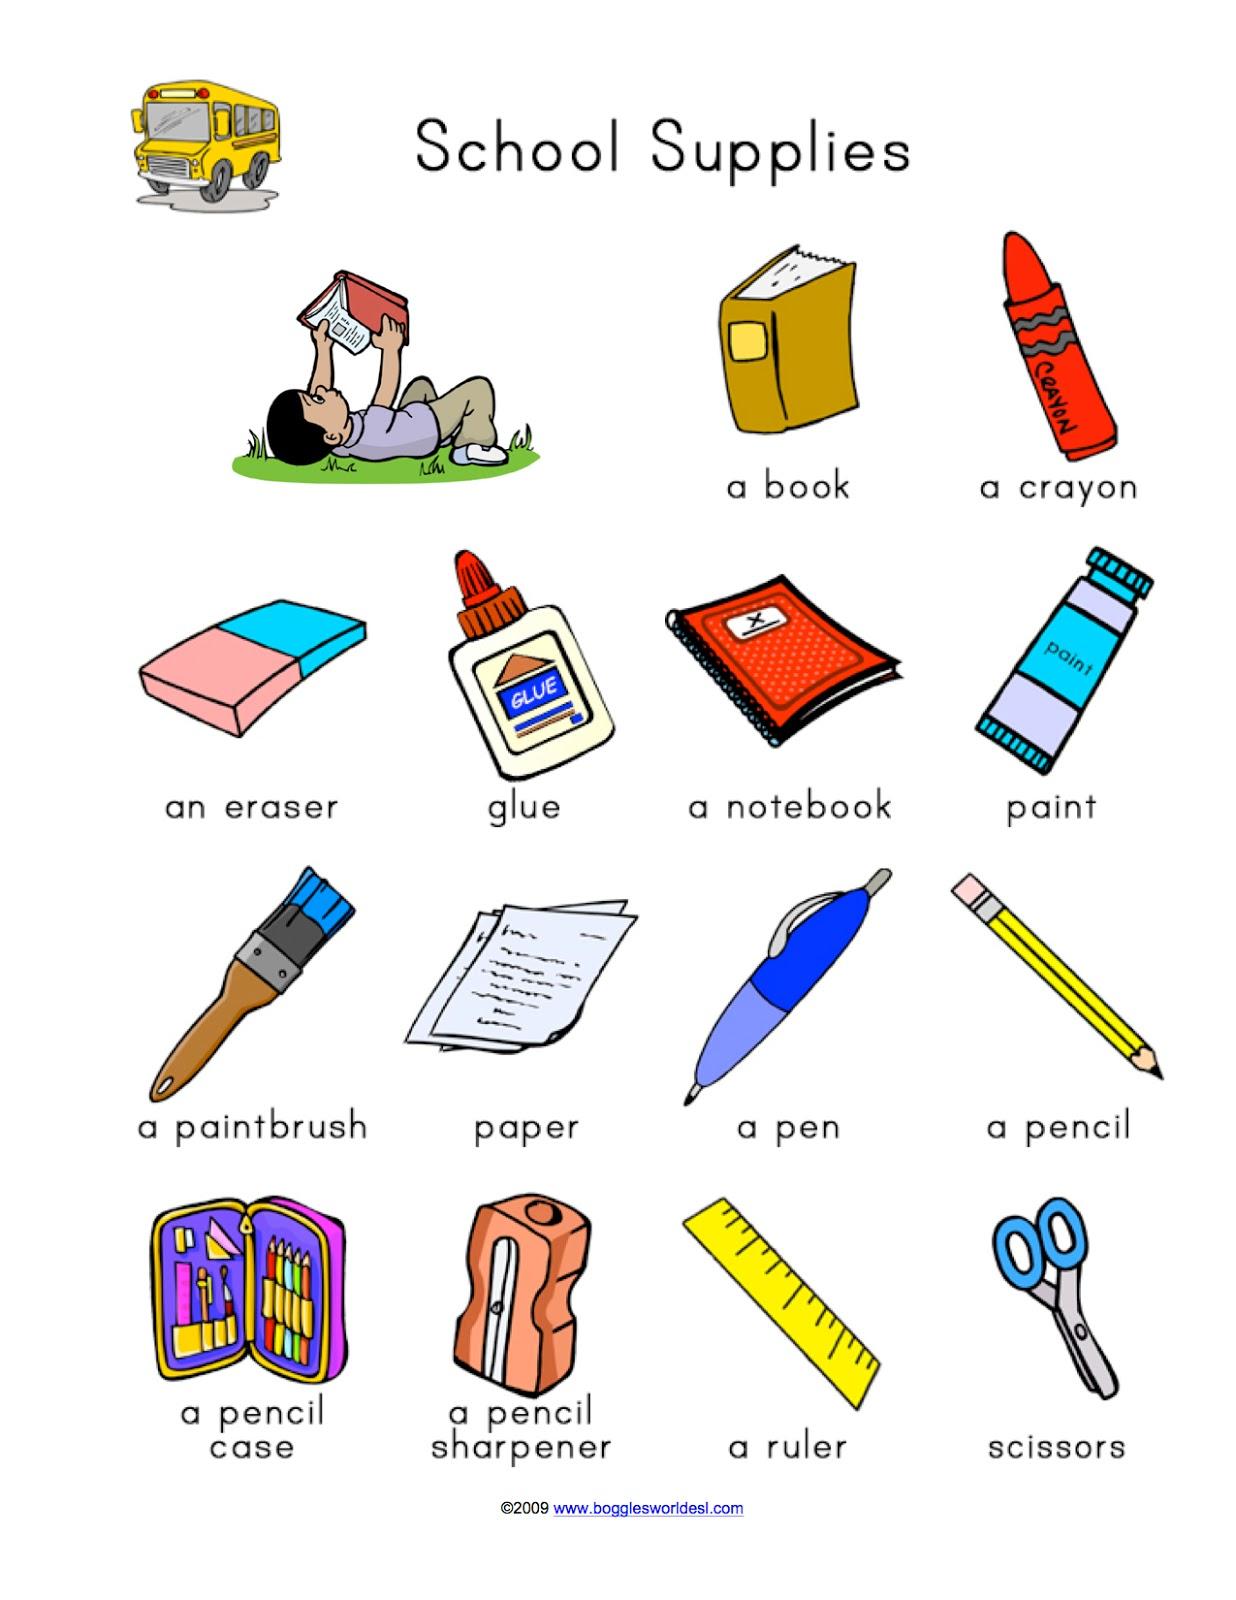 School supply template apexwallpapers com